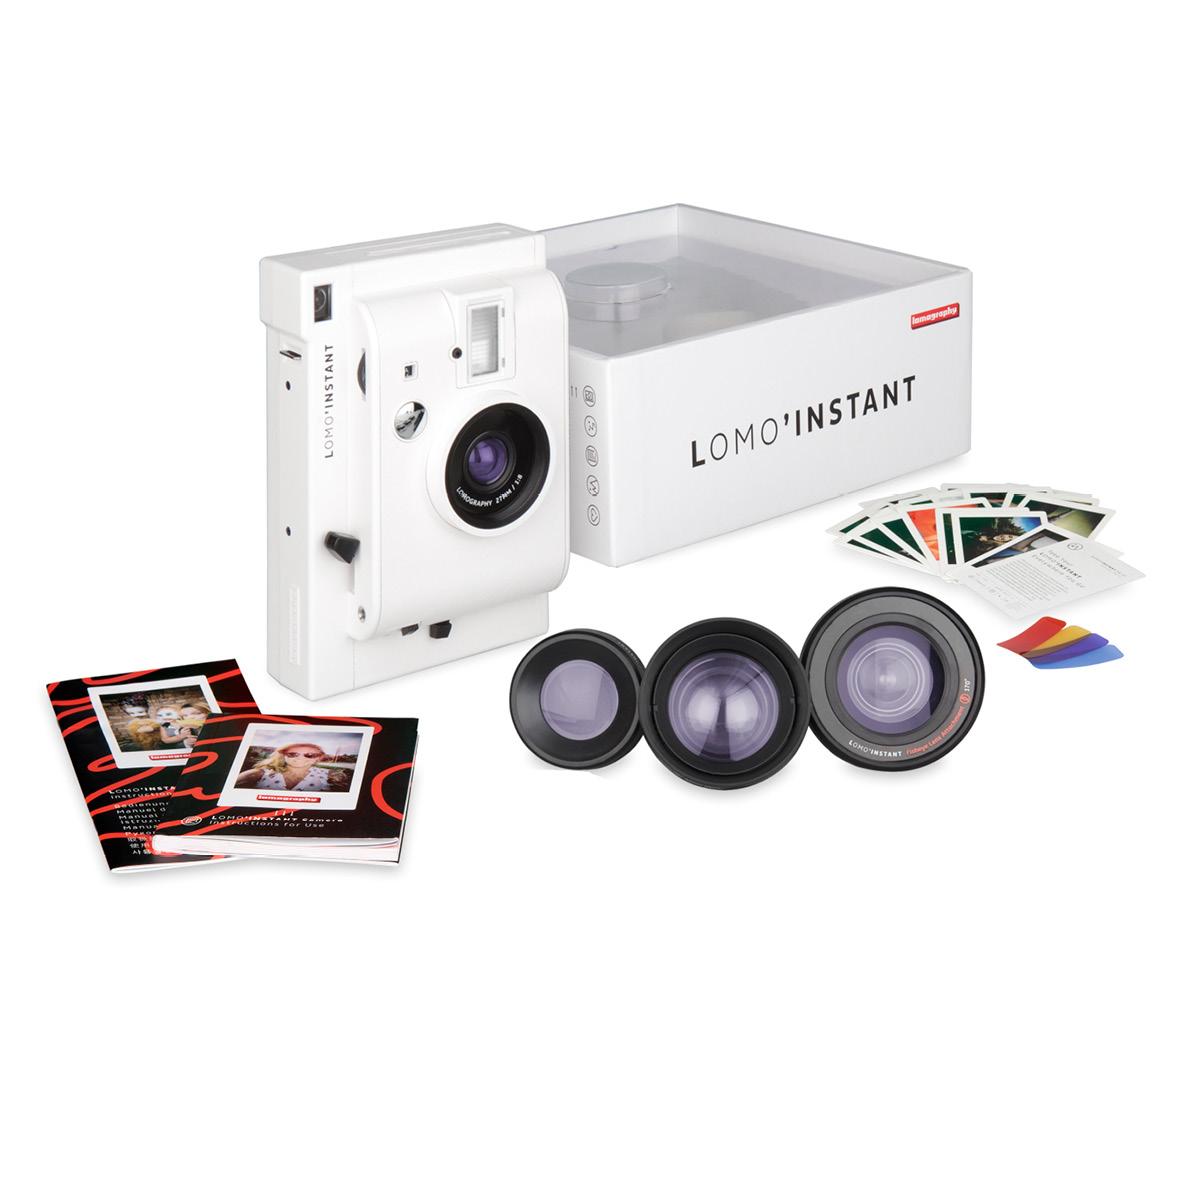 Lomo'Instant Mini White + 3 Lenses